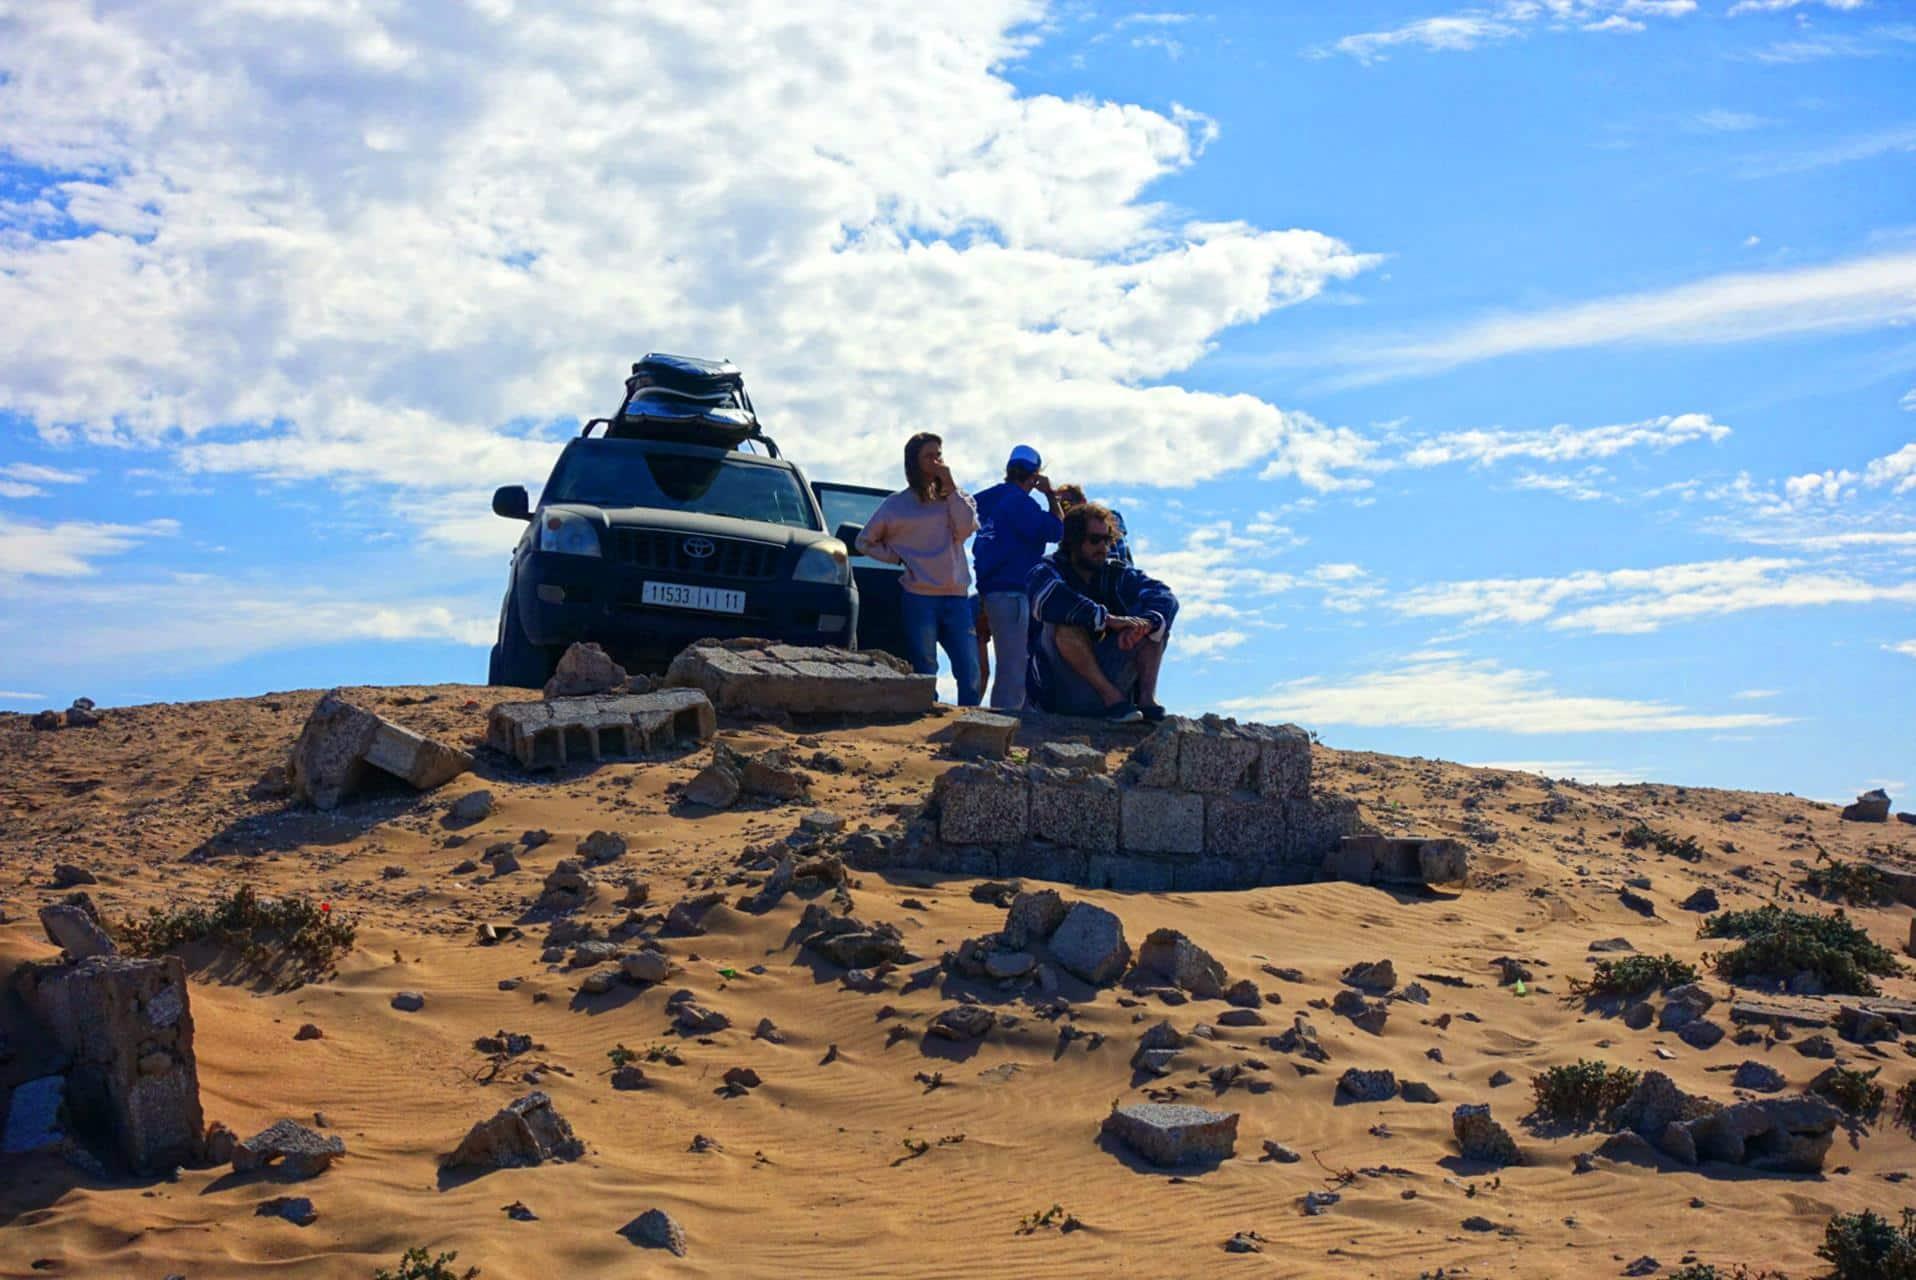 Stop on the desert road